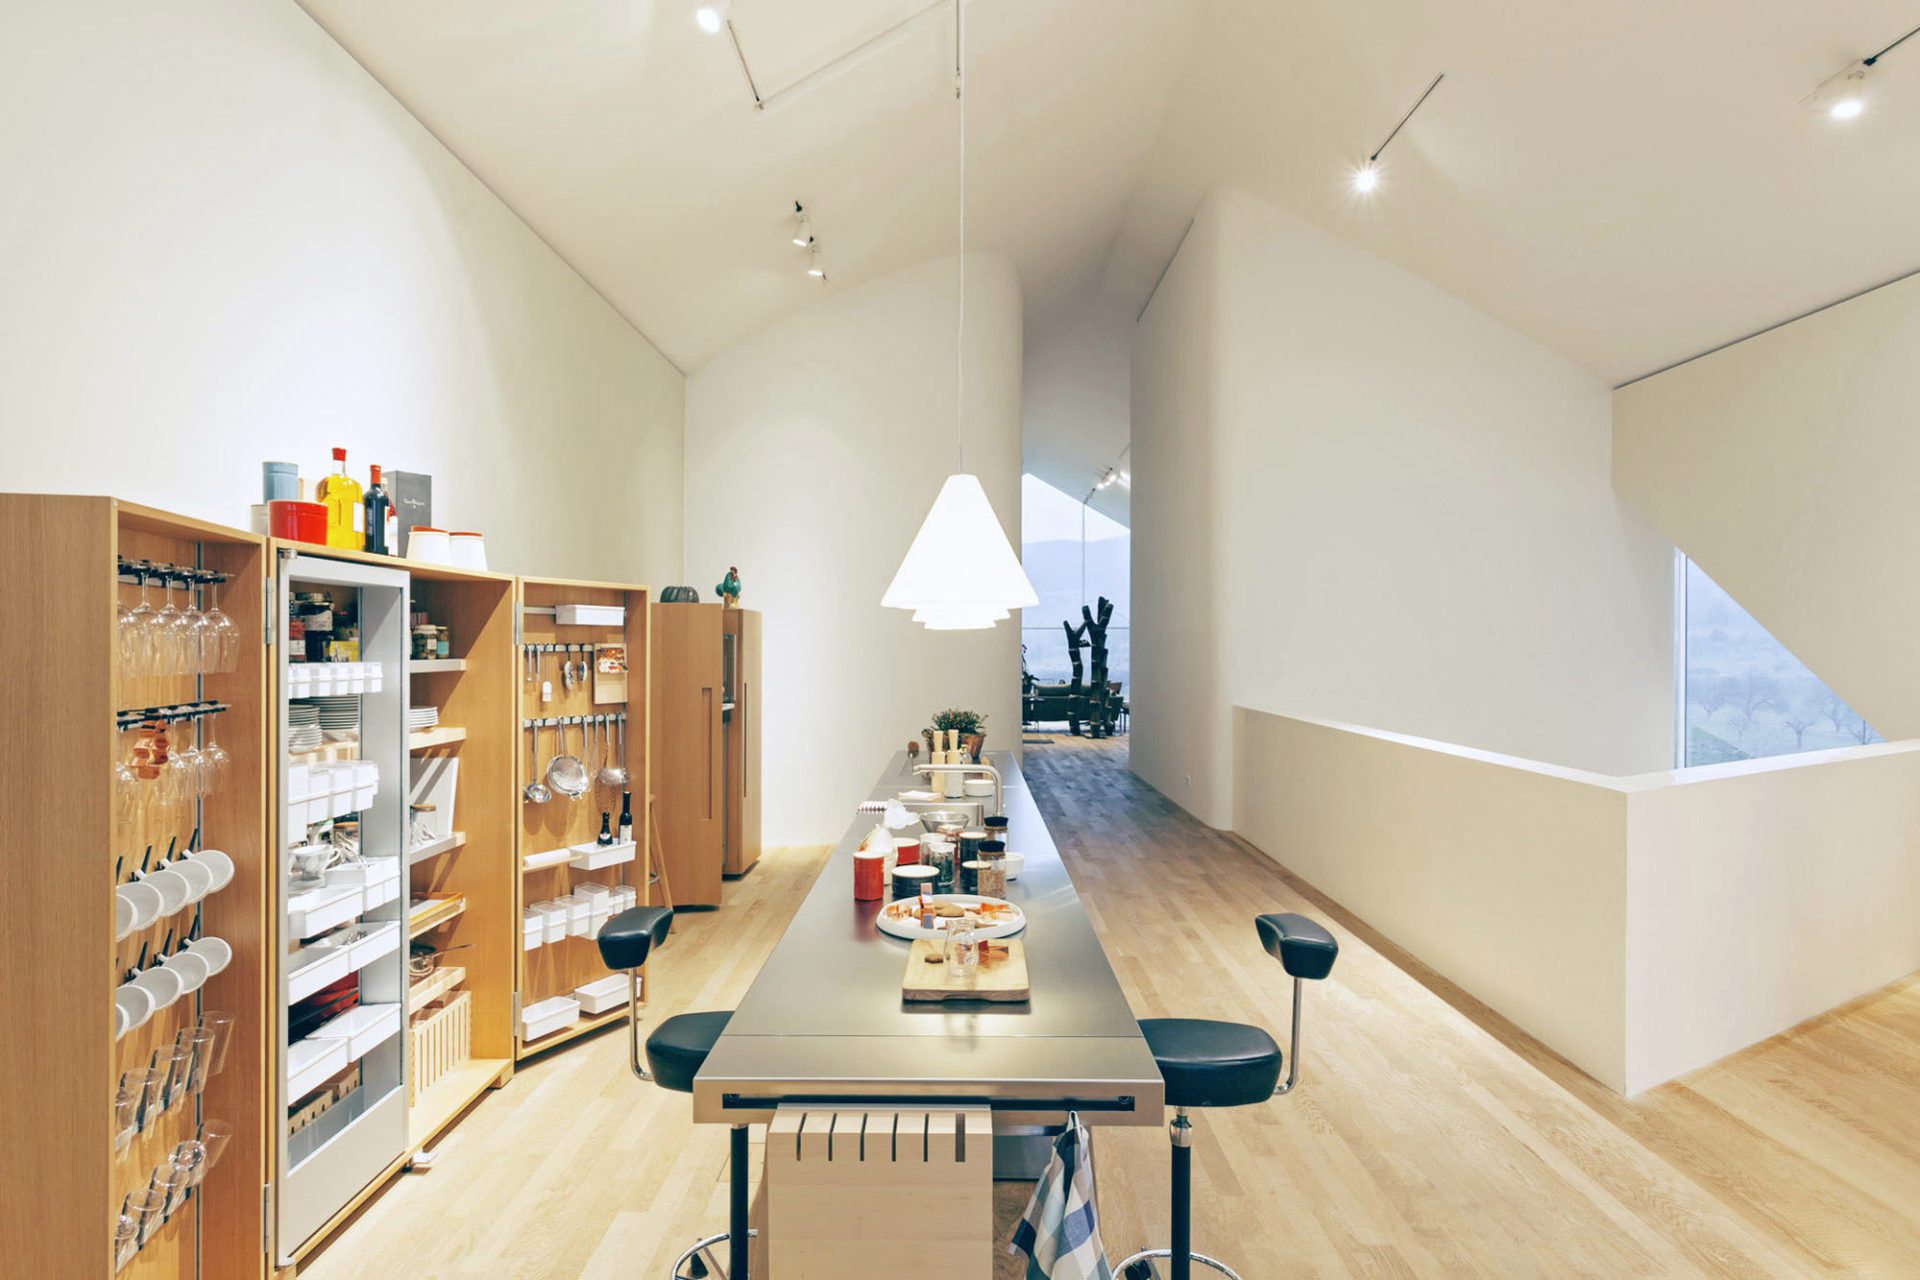 vitra-design-museum-foto-innenarchitektur-henrik-schipper-fotodesign